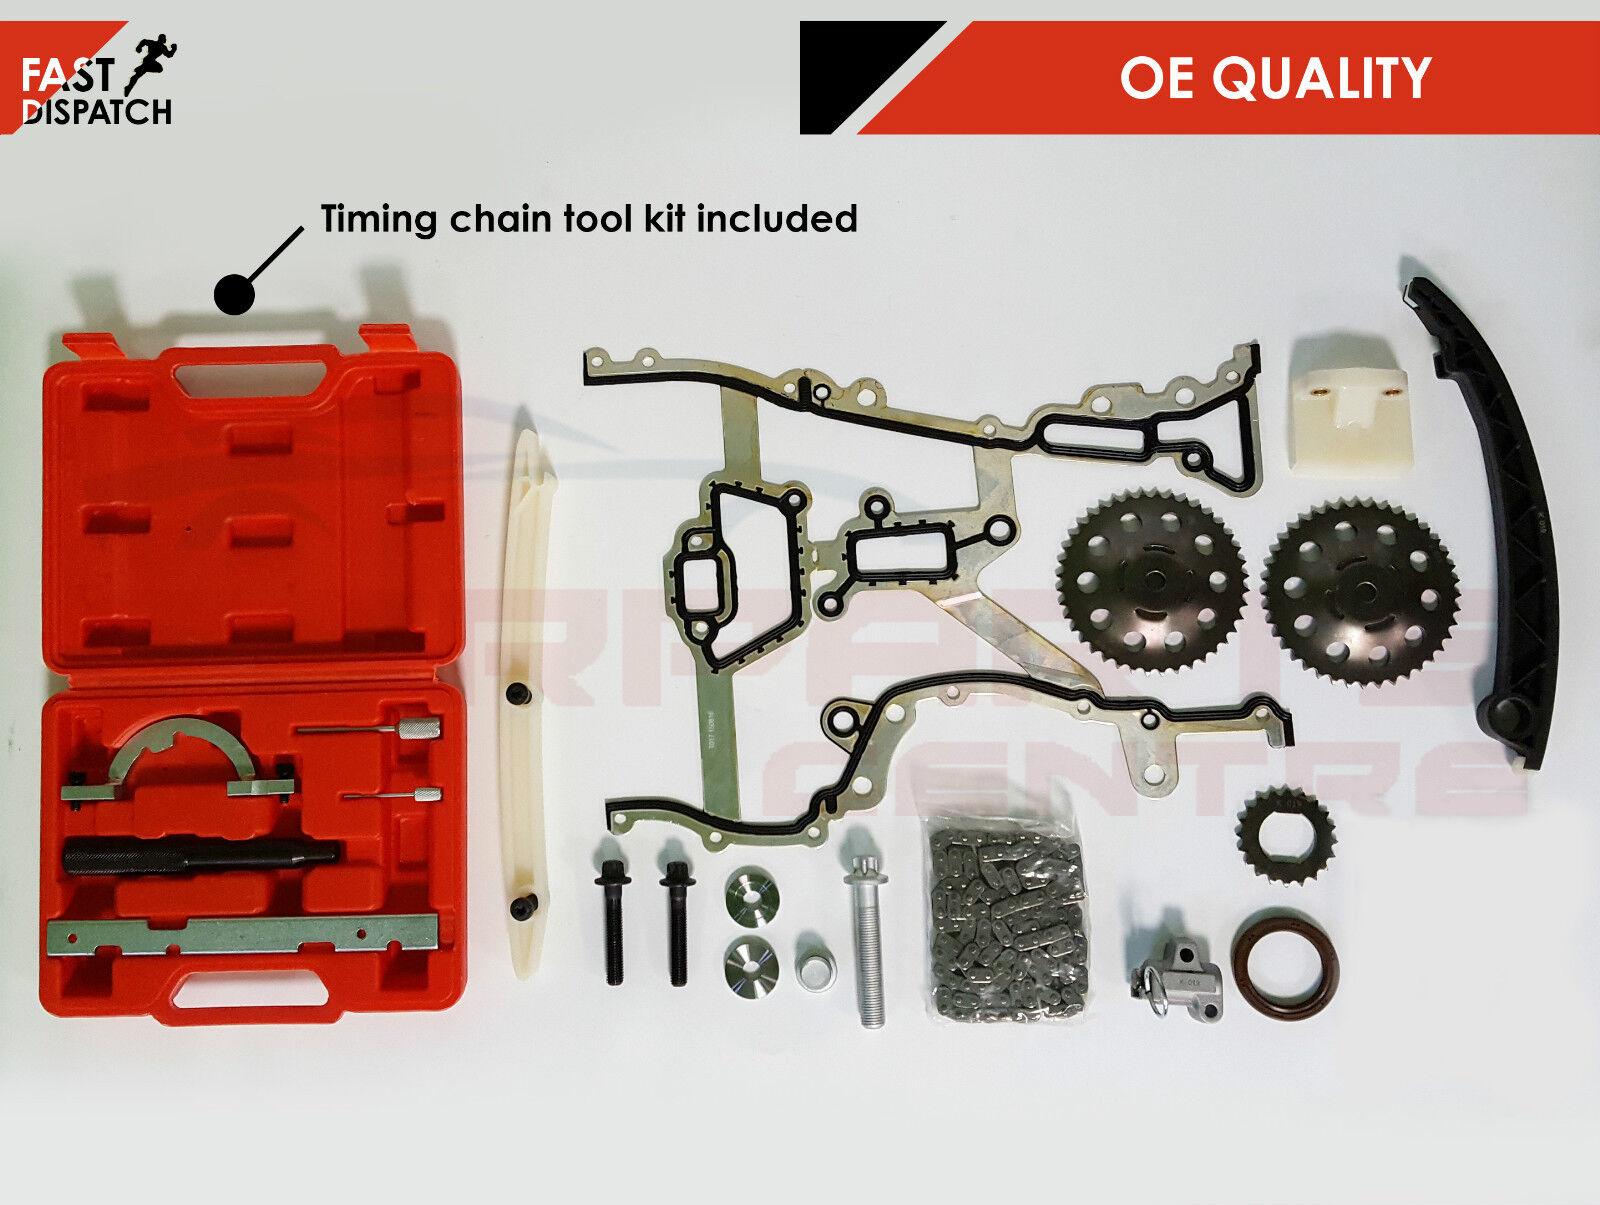 vauxhall corsa timing chain diagram opel vectra radio wiring for ford transit mondeo 2 4 tdci tddi tdi di